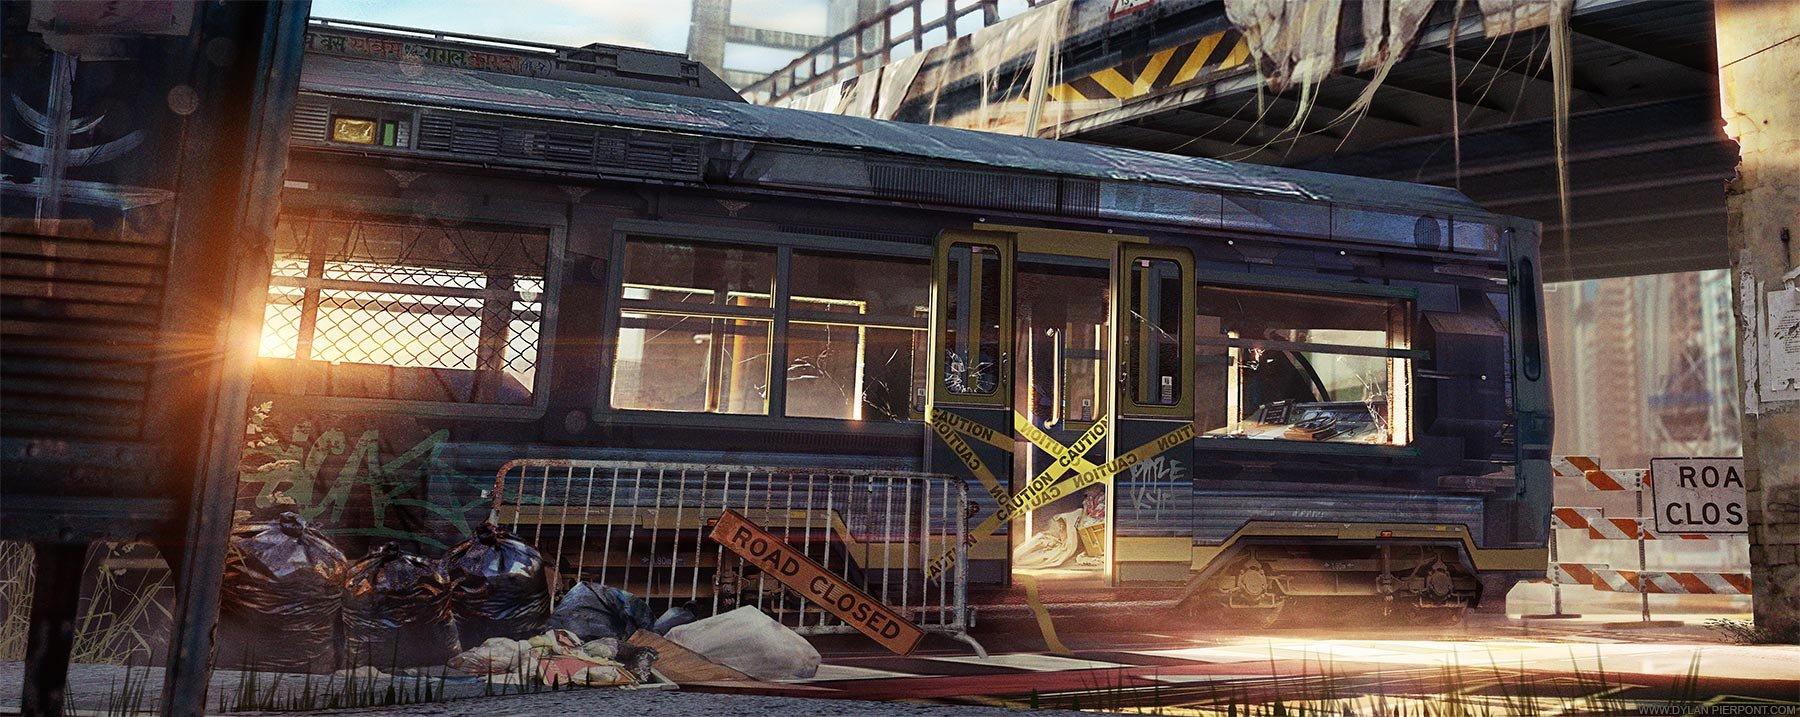 Dylan pierpont dylanpierpont the precipice railcar